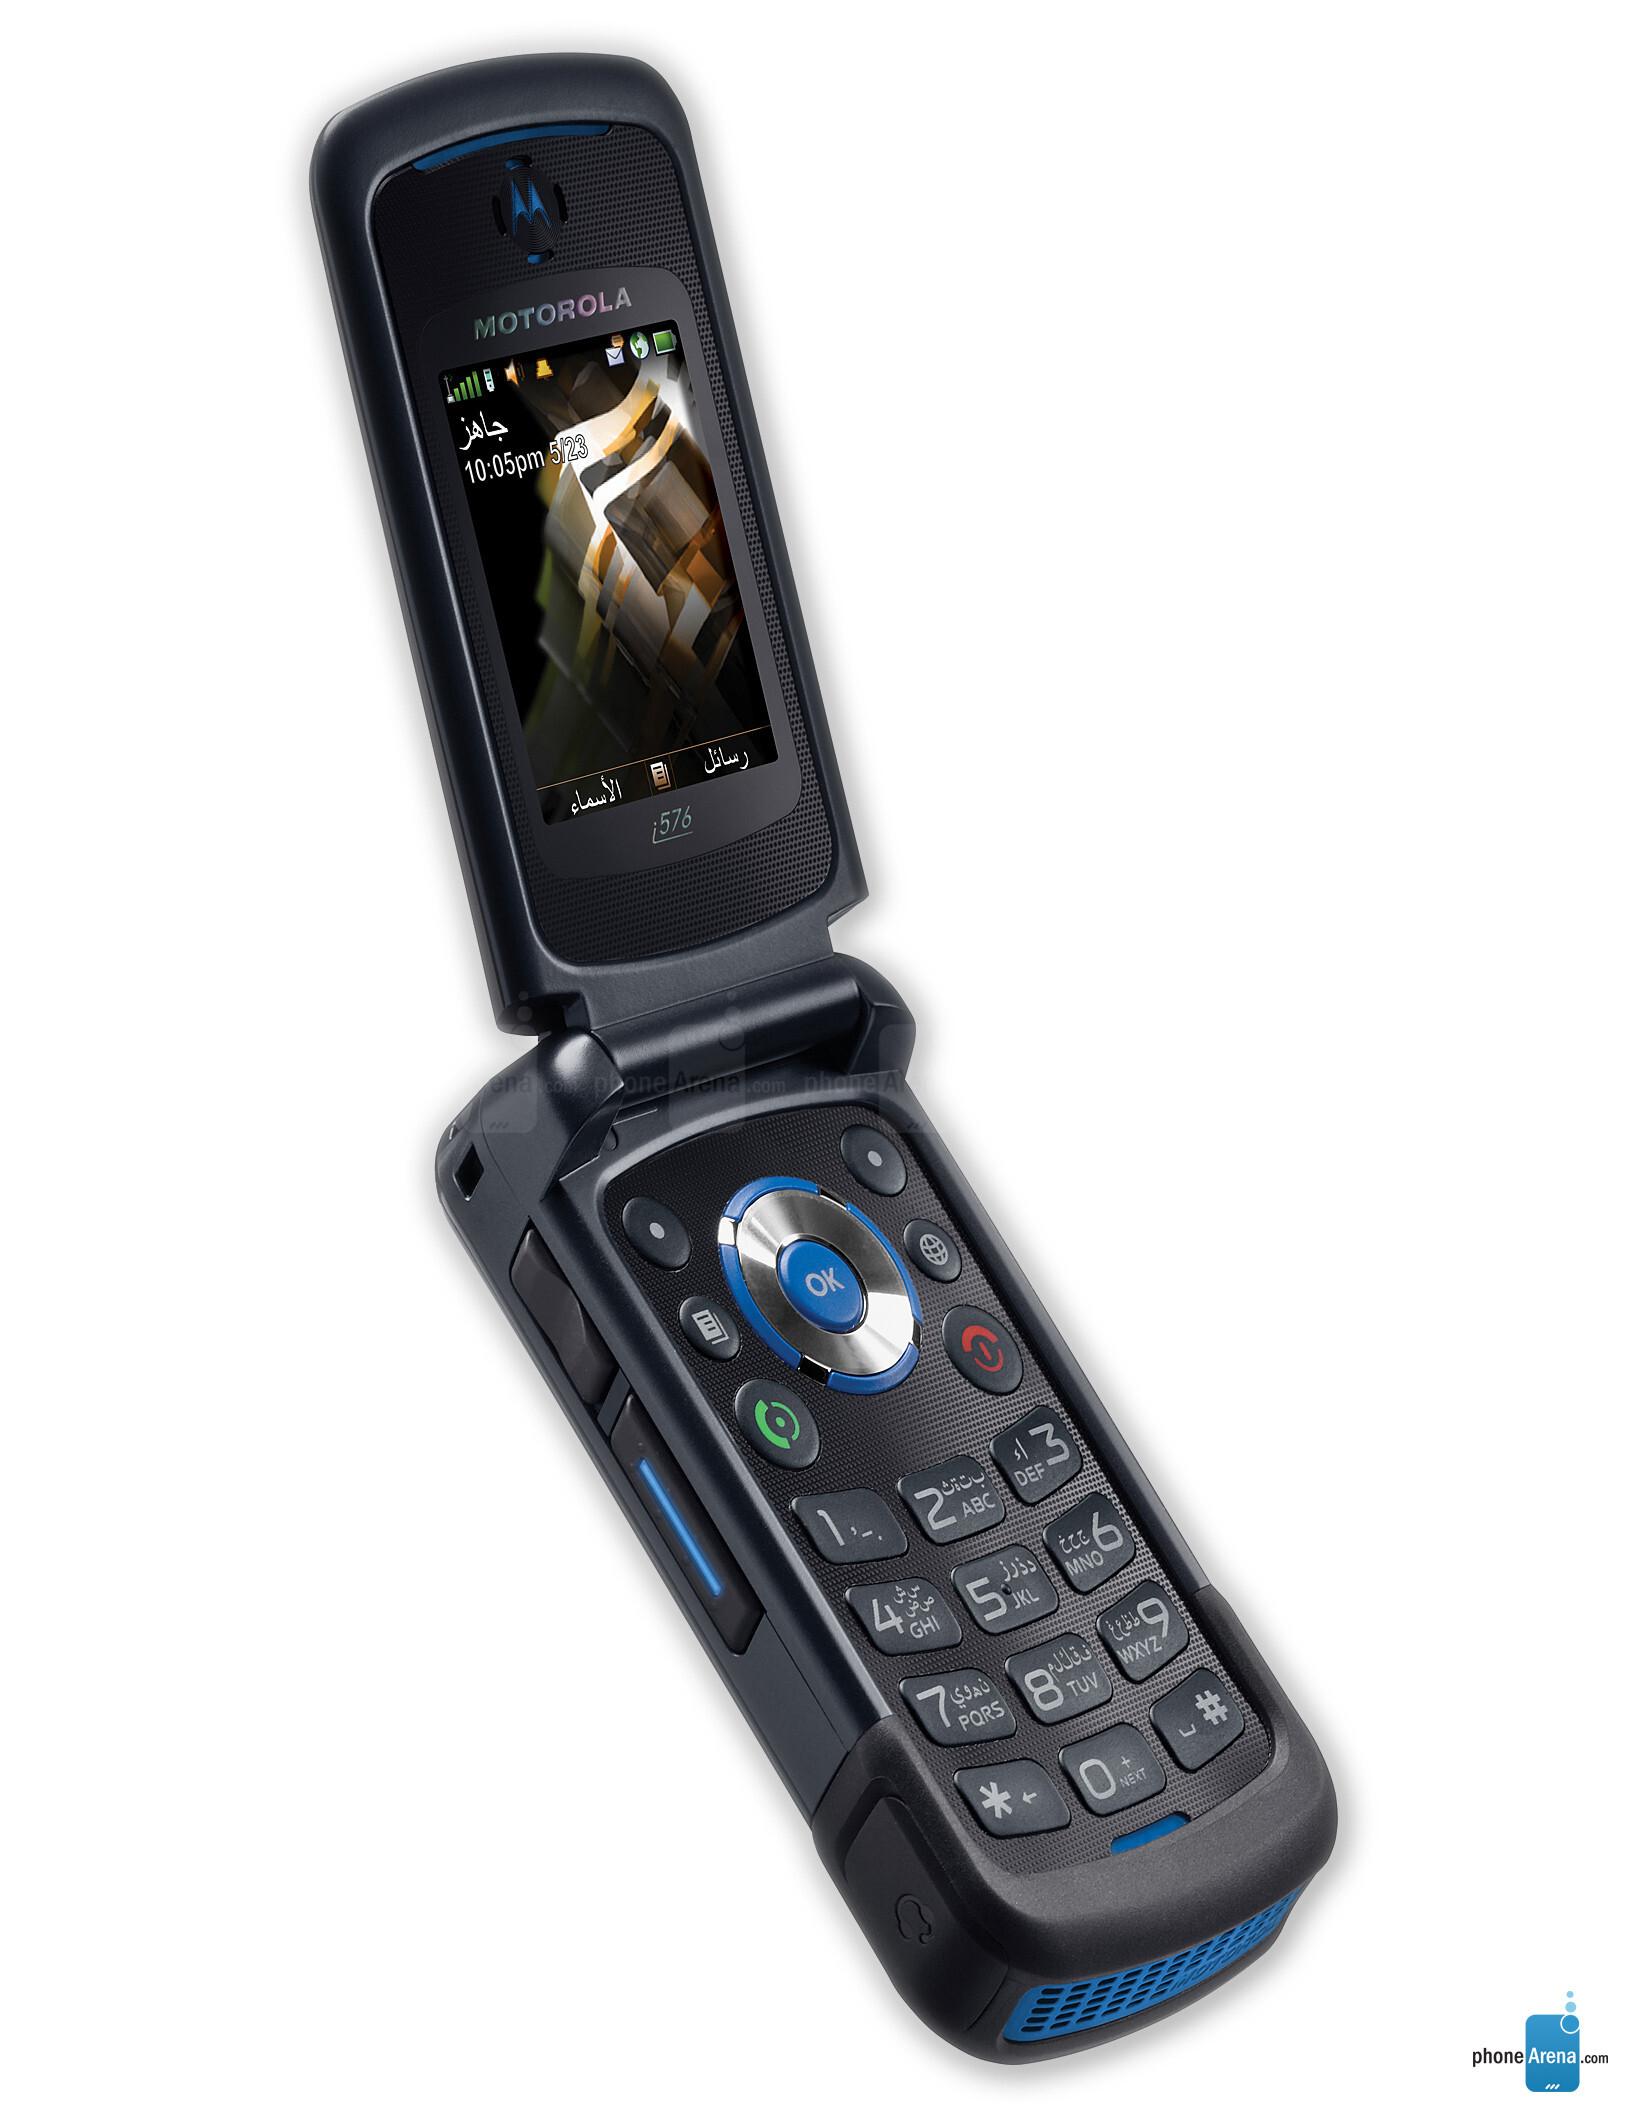 motorola i576 drivers for mac download rh great natural home remedies com AT&T Motorola Flip Phones AT&T Motorola Flip Phones